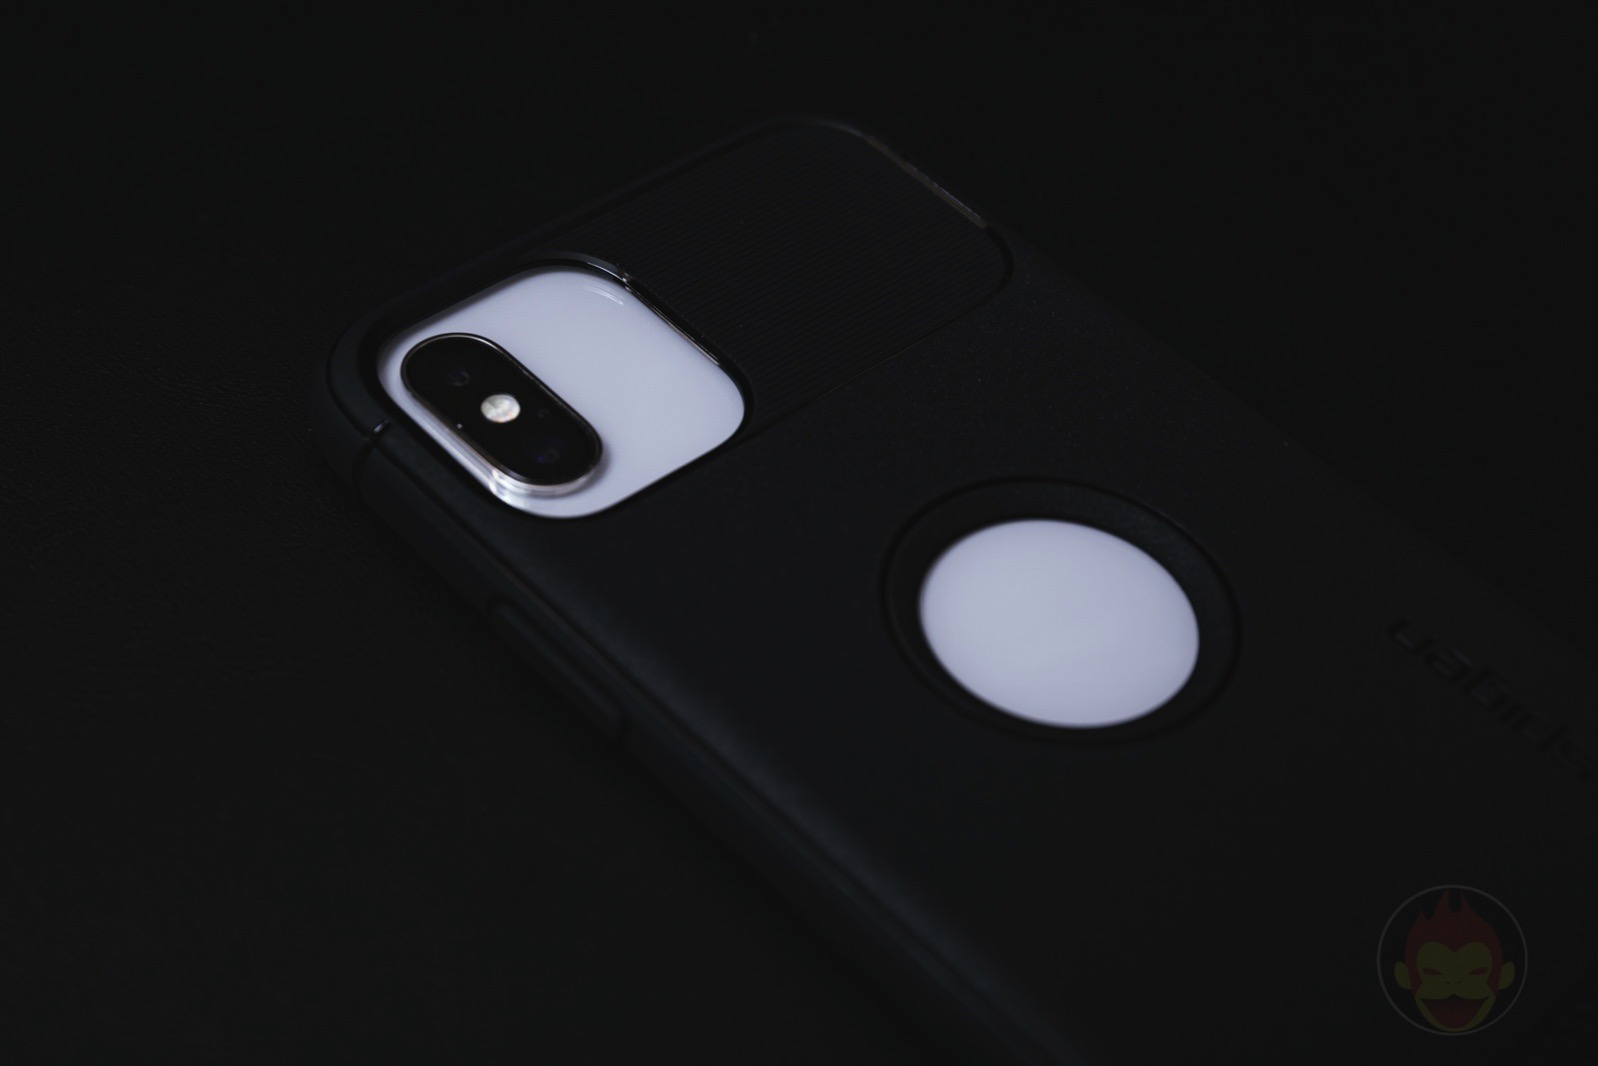 Spigen-iPhone-11-Pro-Case-Review-05.jpg